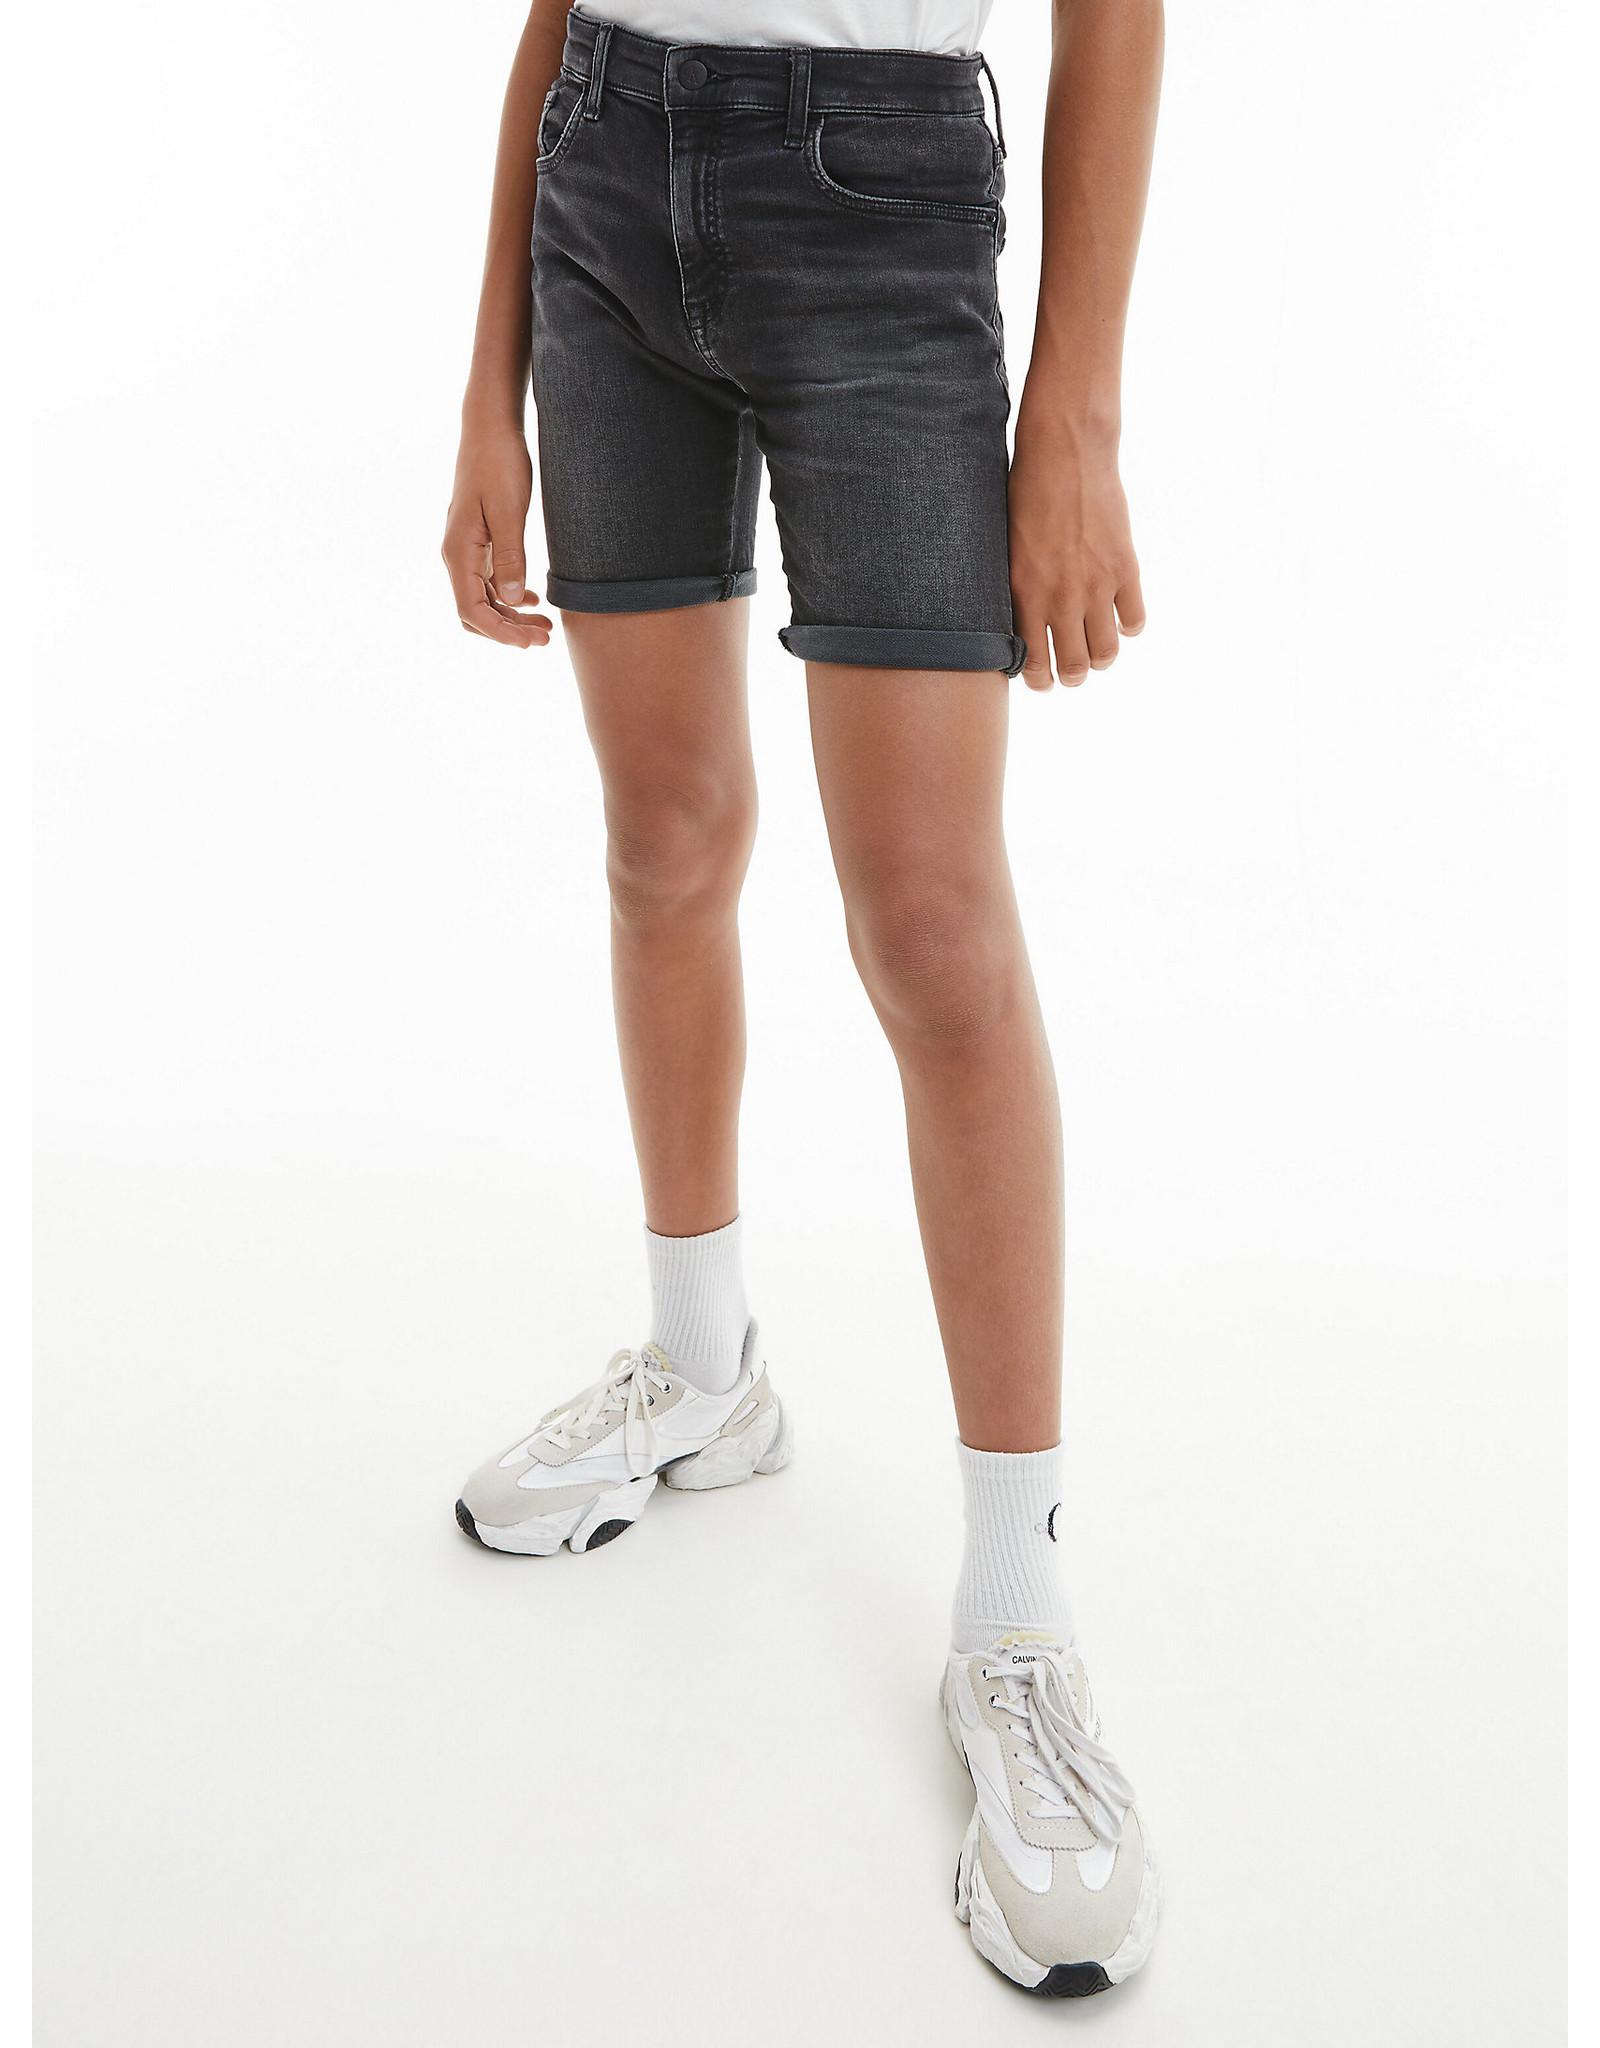 Calvin Klein 0416 Short